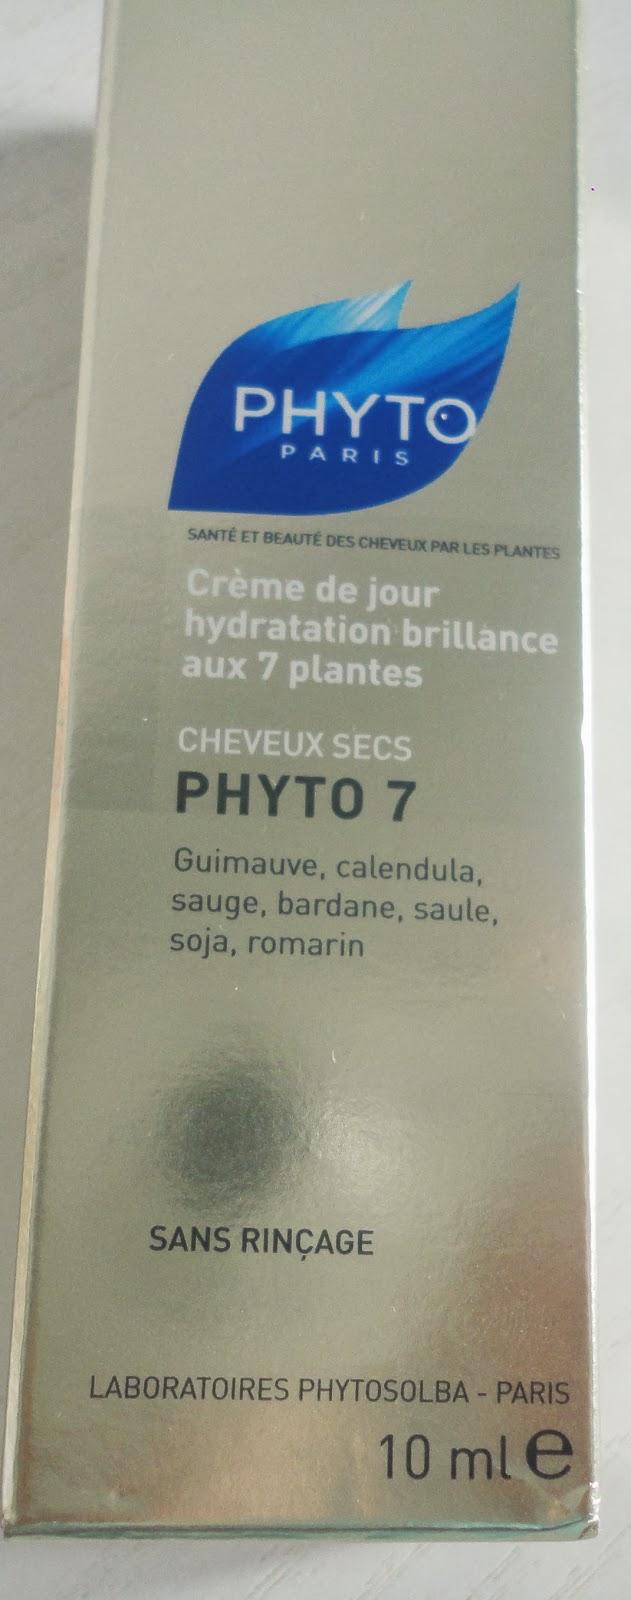 lpfbox-phyto-7